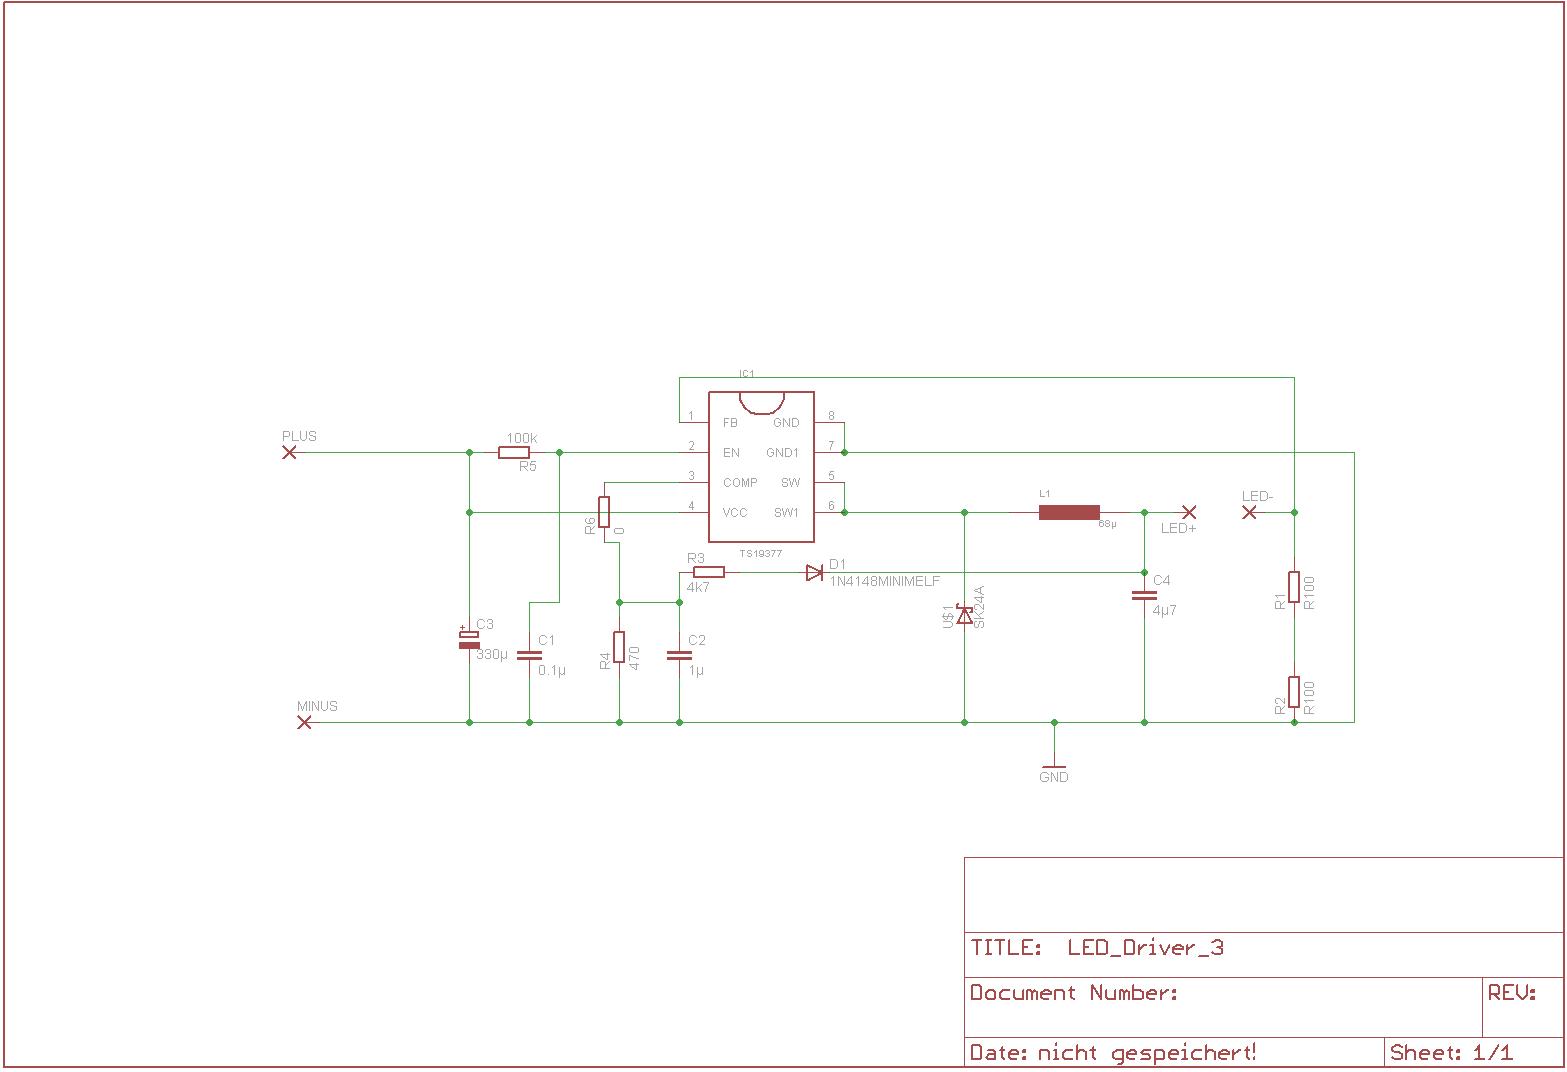 LED KSQ schaltetnt mit TS19377 - Mikrocontroller.net